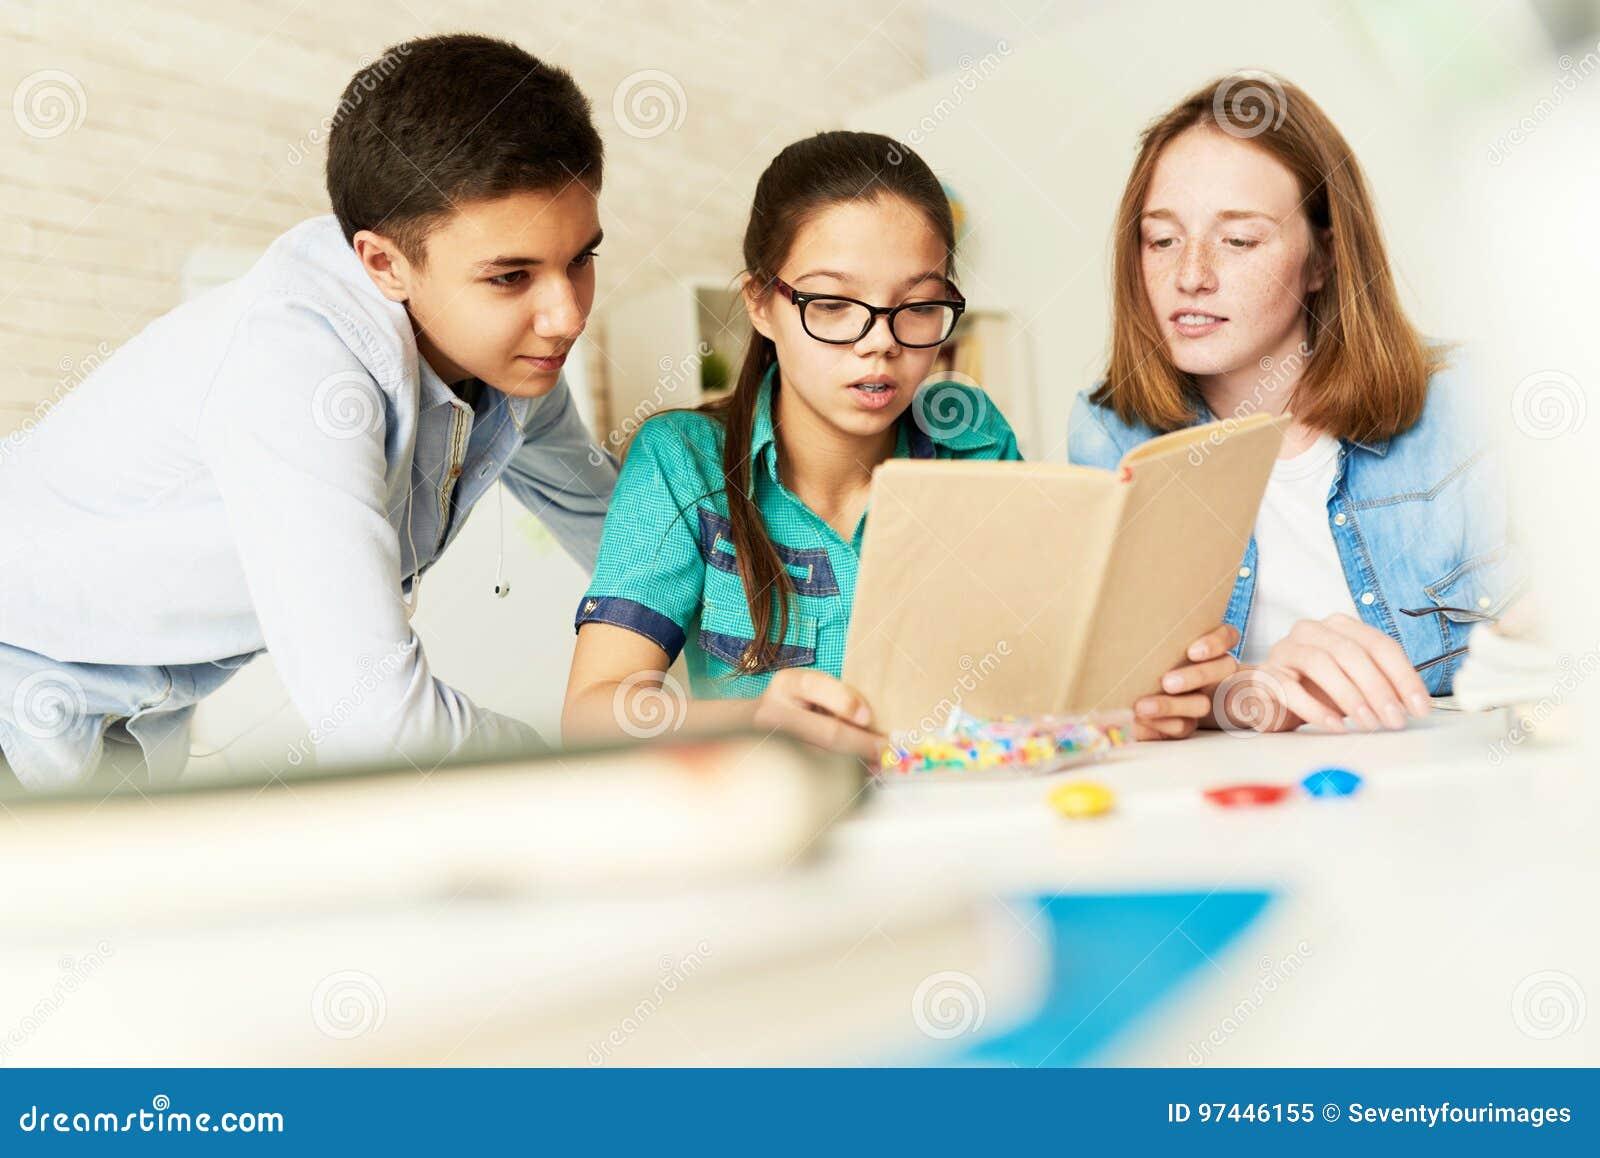 School Kids Reading Book Together